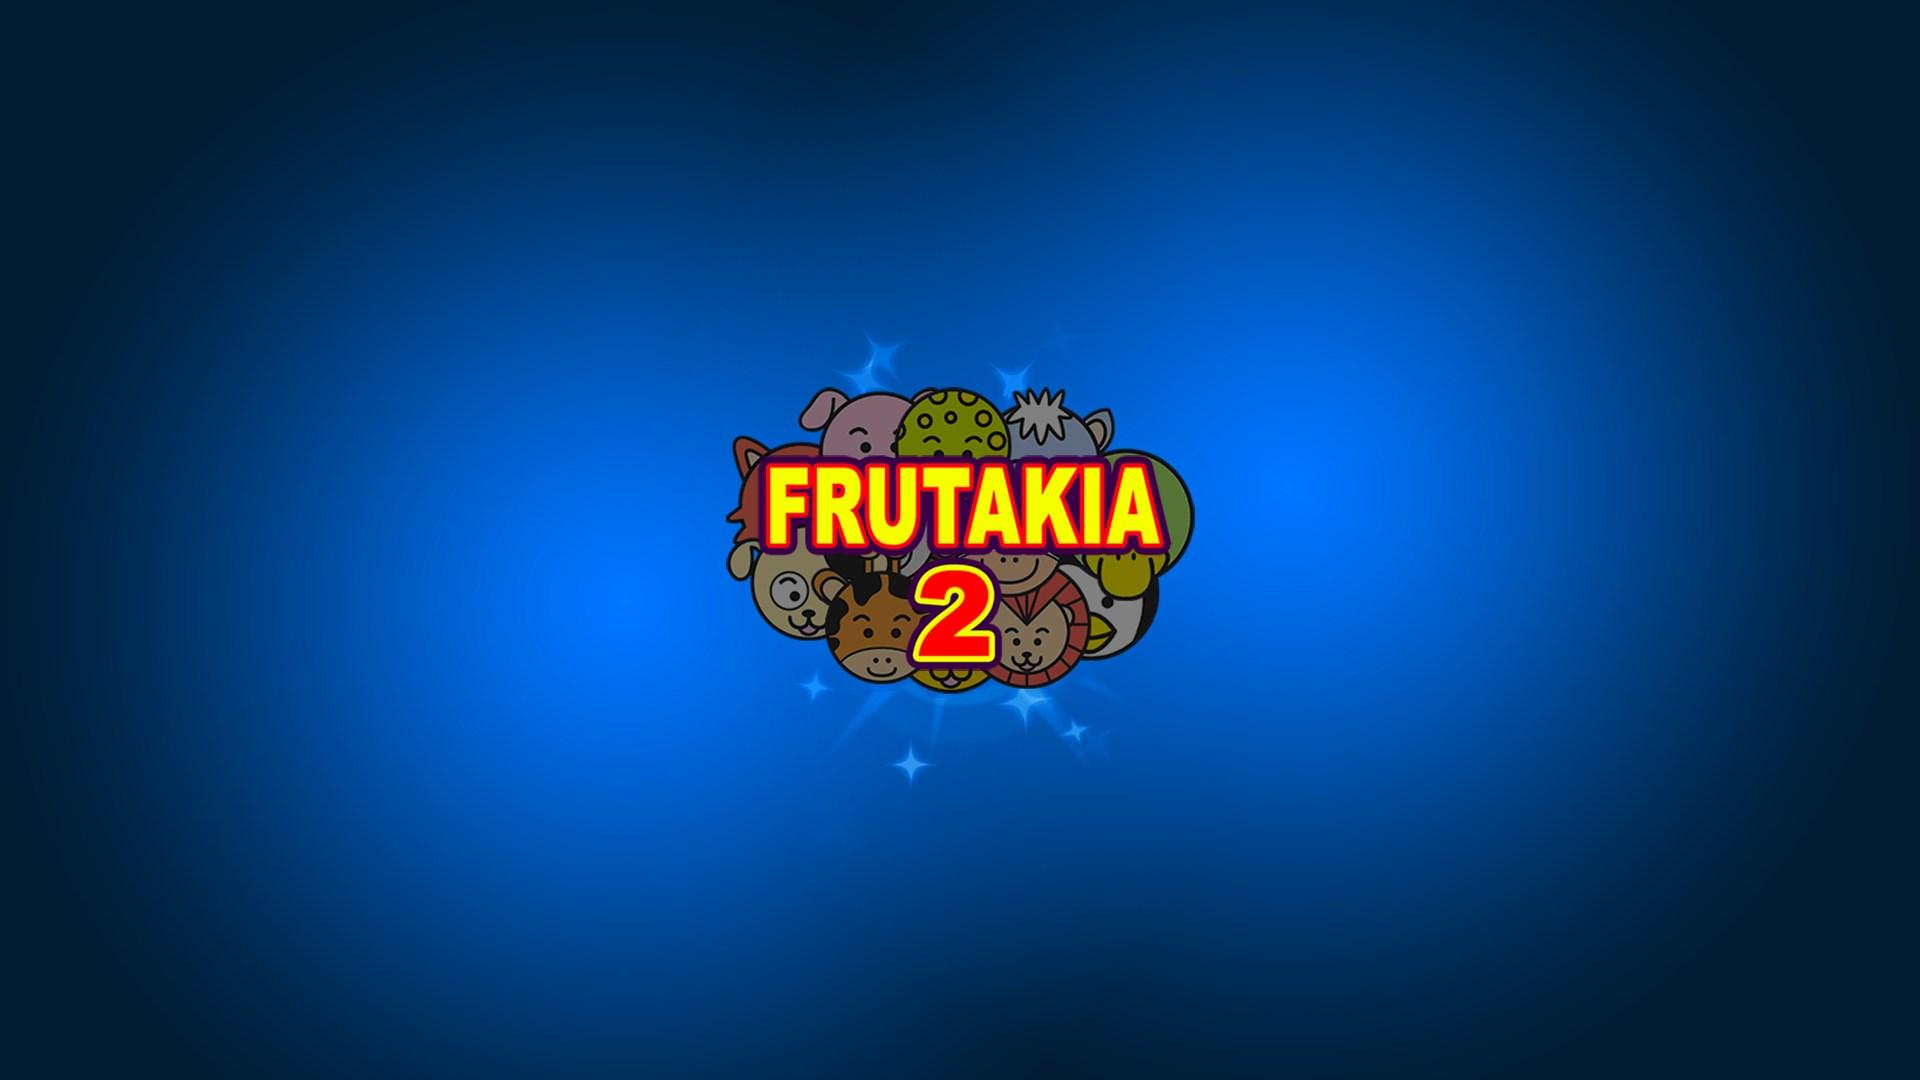 Get Frutakia 2 Lite Microsoft Store Speed Small Tiger Model Remote Control Boat Receiver Circuit Board